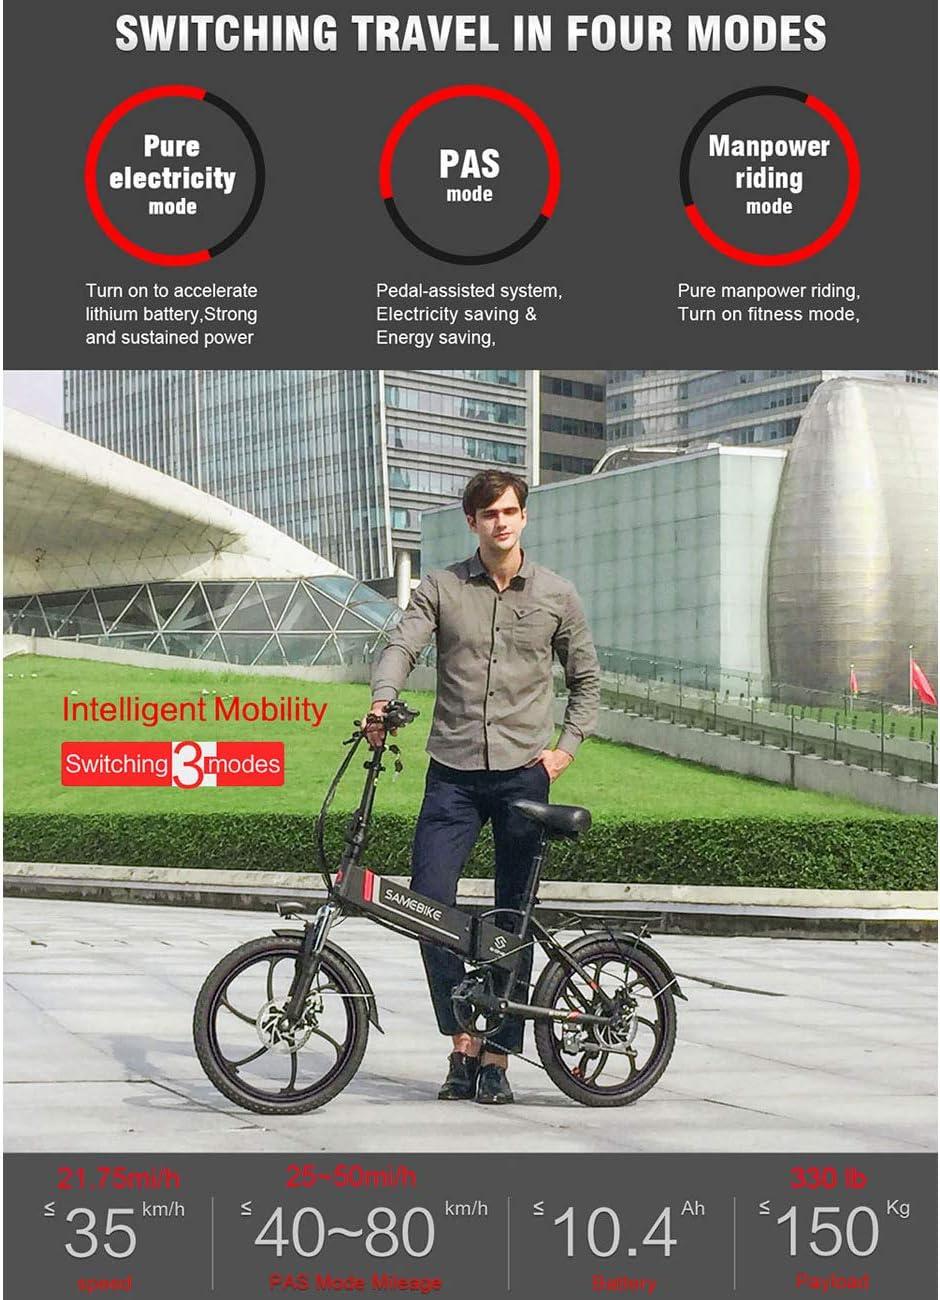 Aluminio SAMEBIKE Bicicleta el/éctrica Mando a Distancia 20 Pulgadas Bicicleta el/éctrica Plegable bater/ía de Litio de 48 V Plegable port/átil 10 Ah